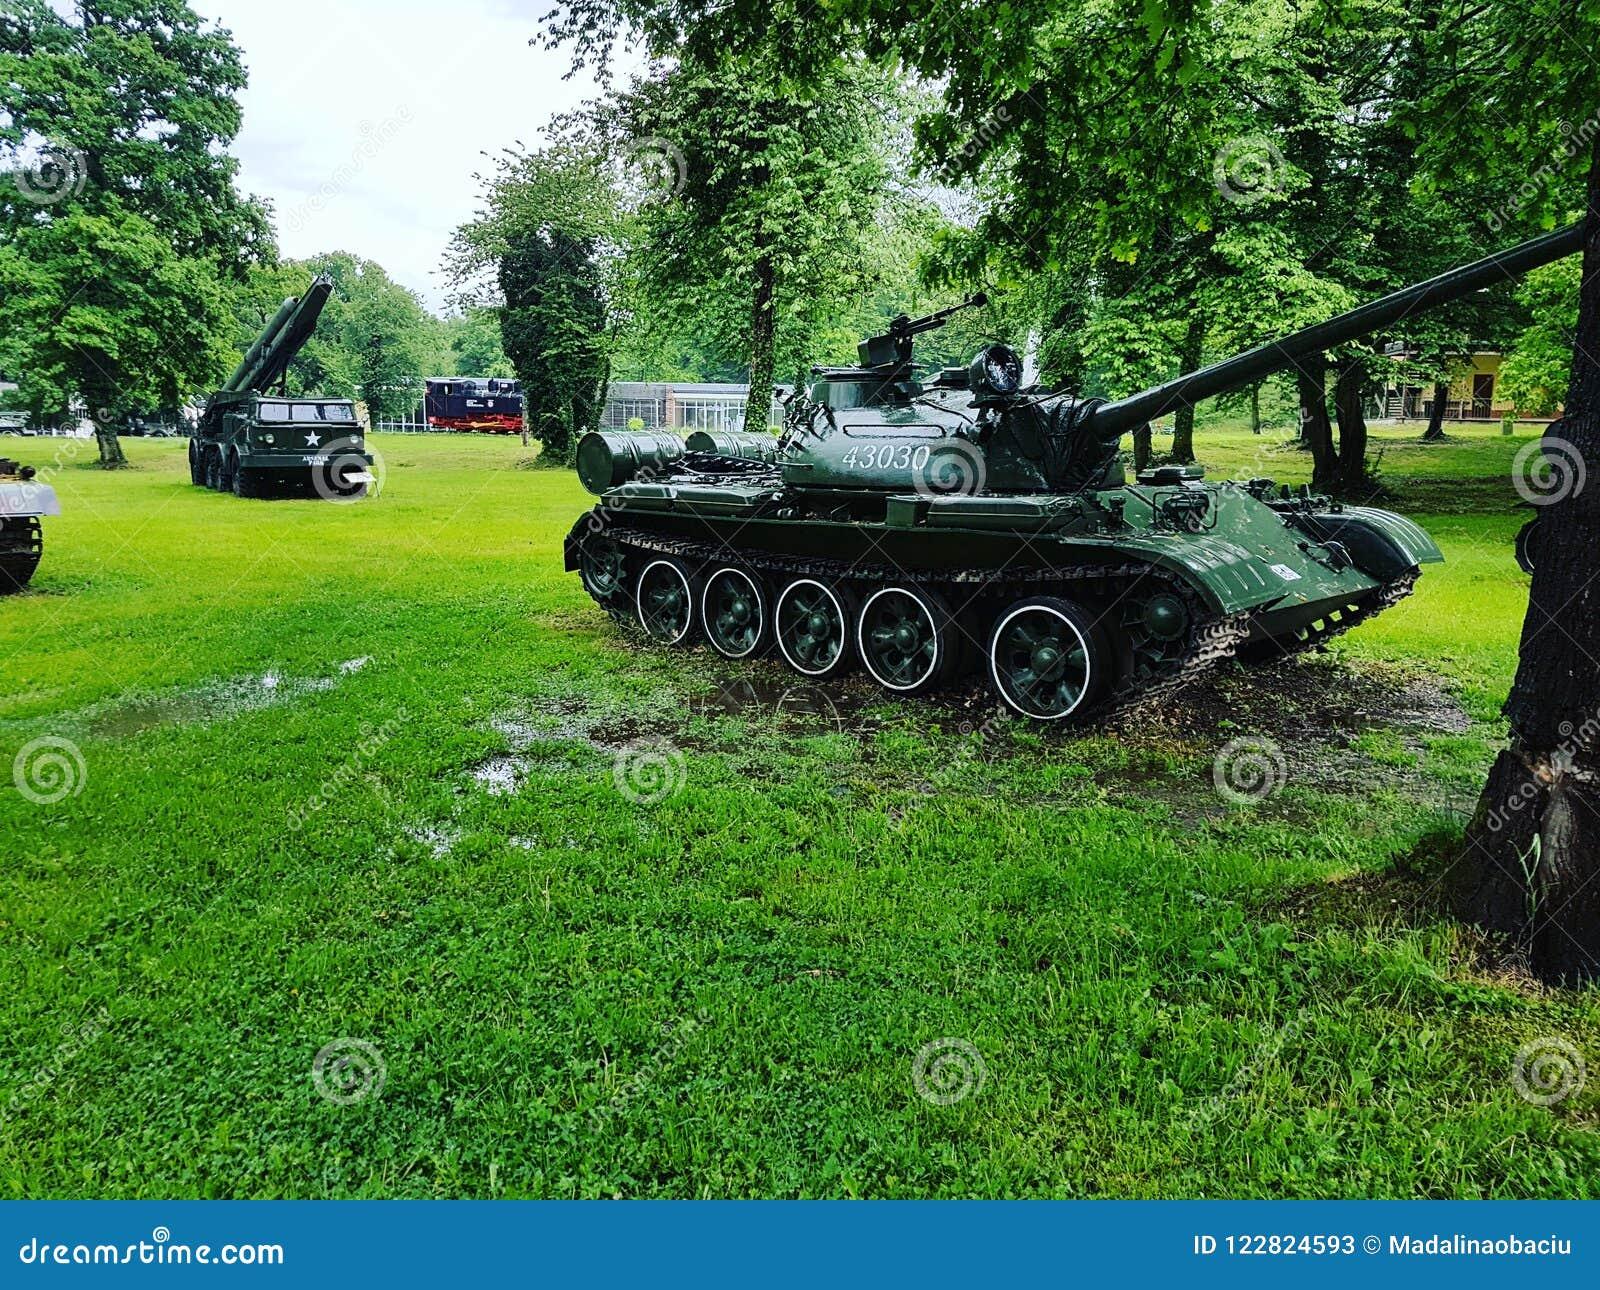 War tanks at Arsenal Park